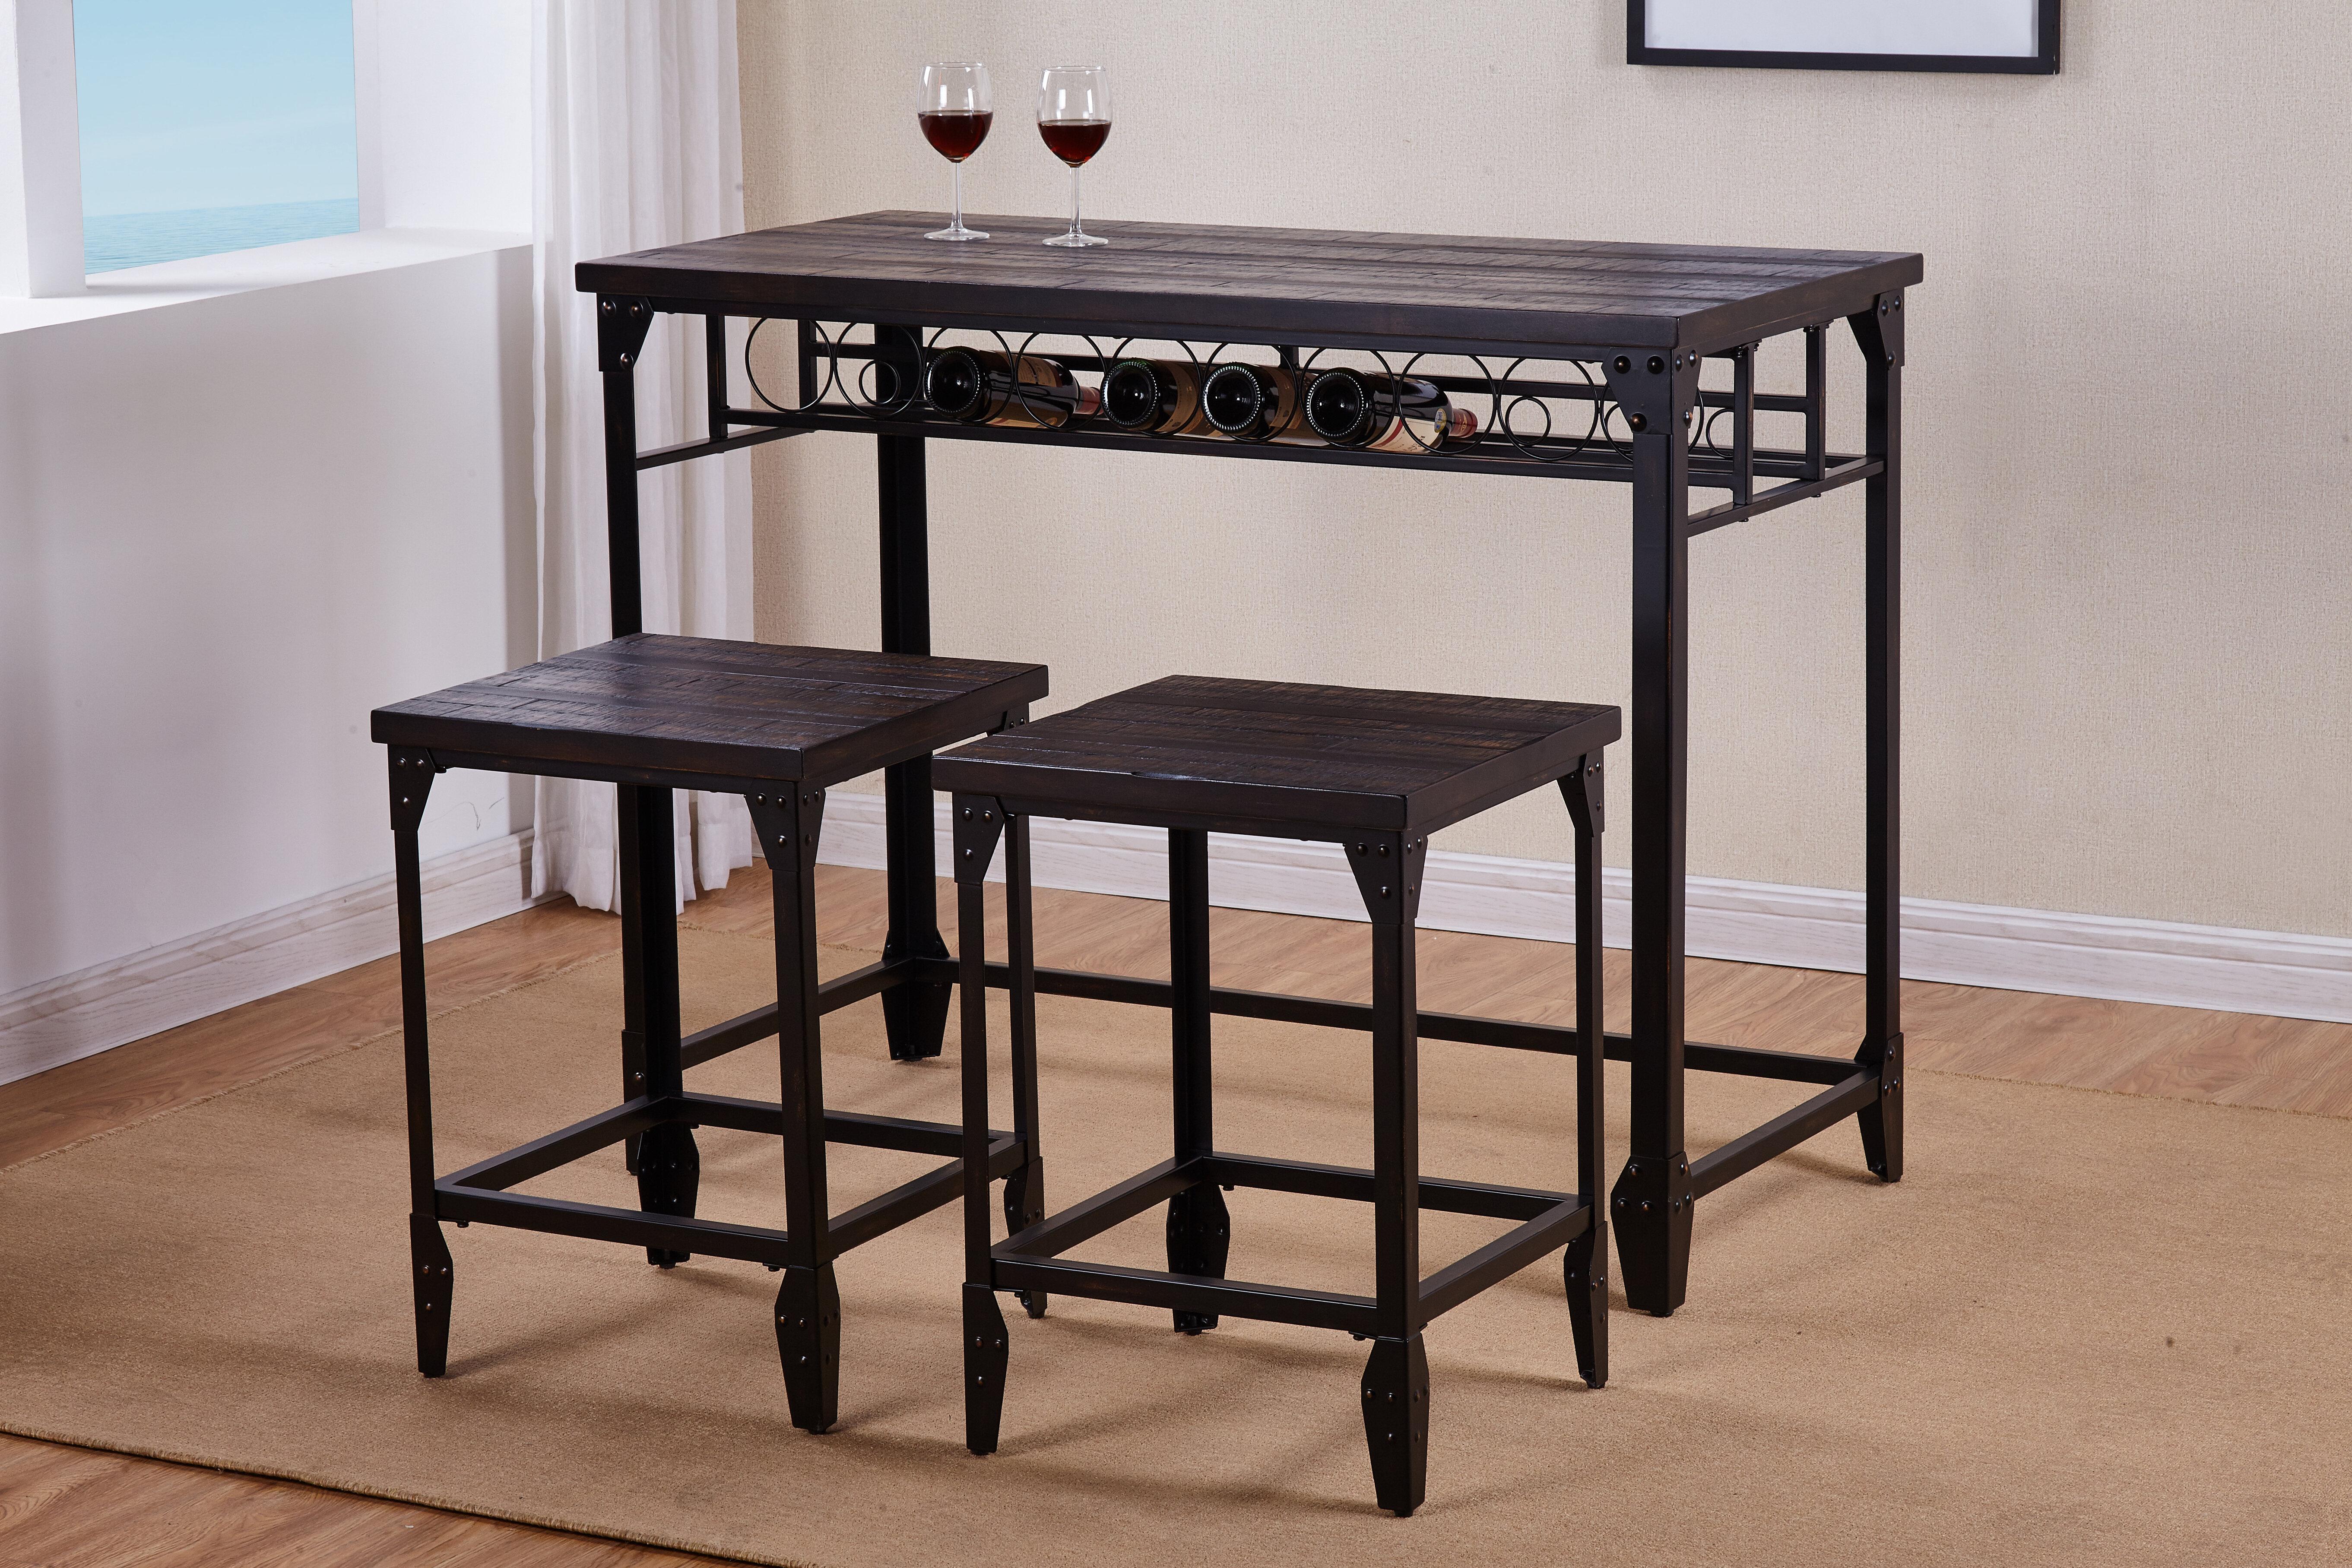 Greyleigh Arwood 3 Piece Counter Height Dining Table Set Reviews Wayfair